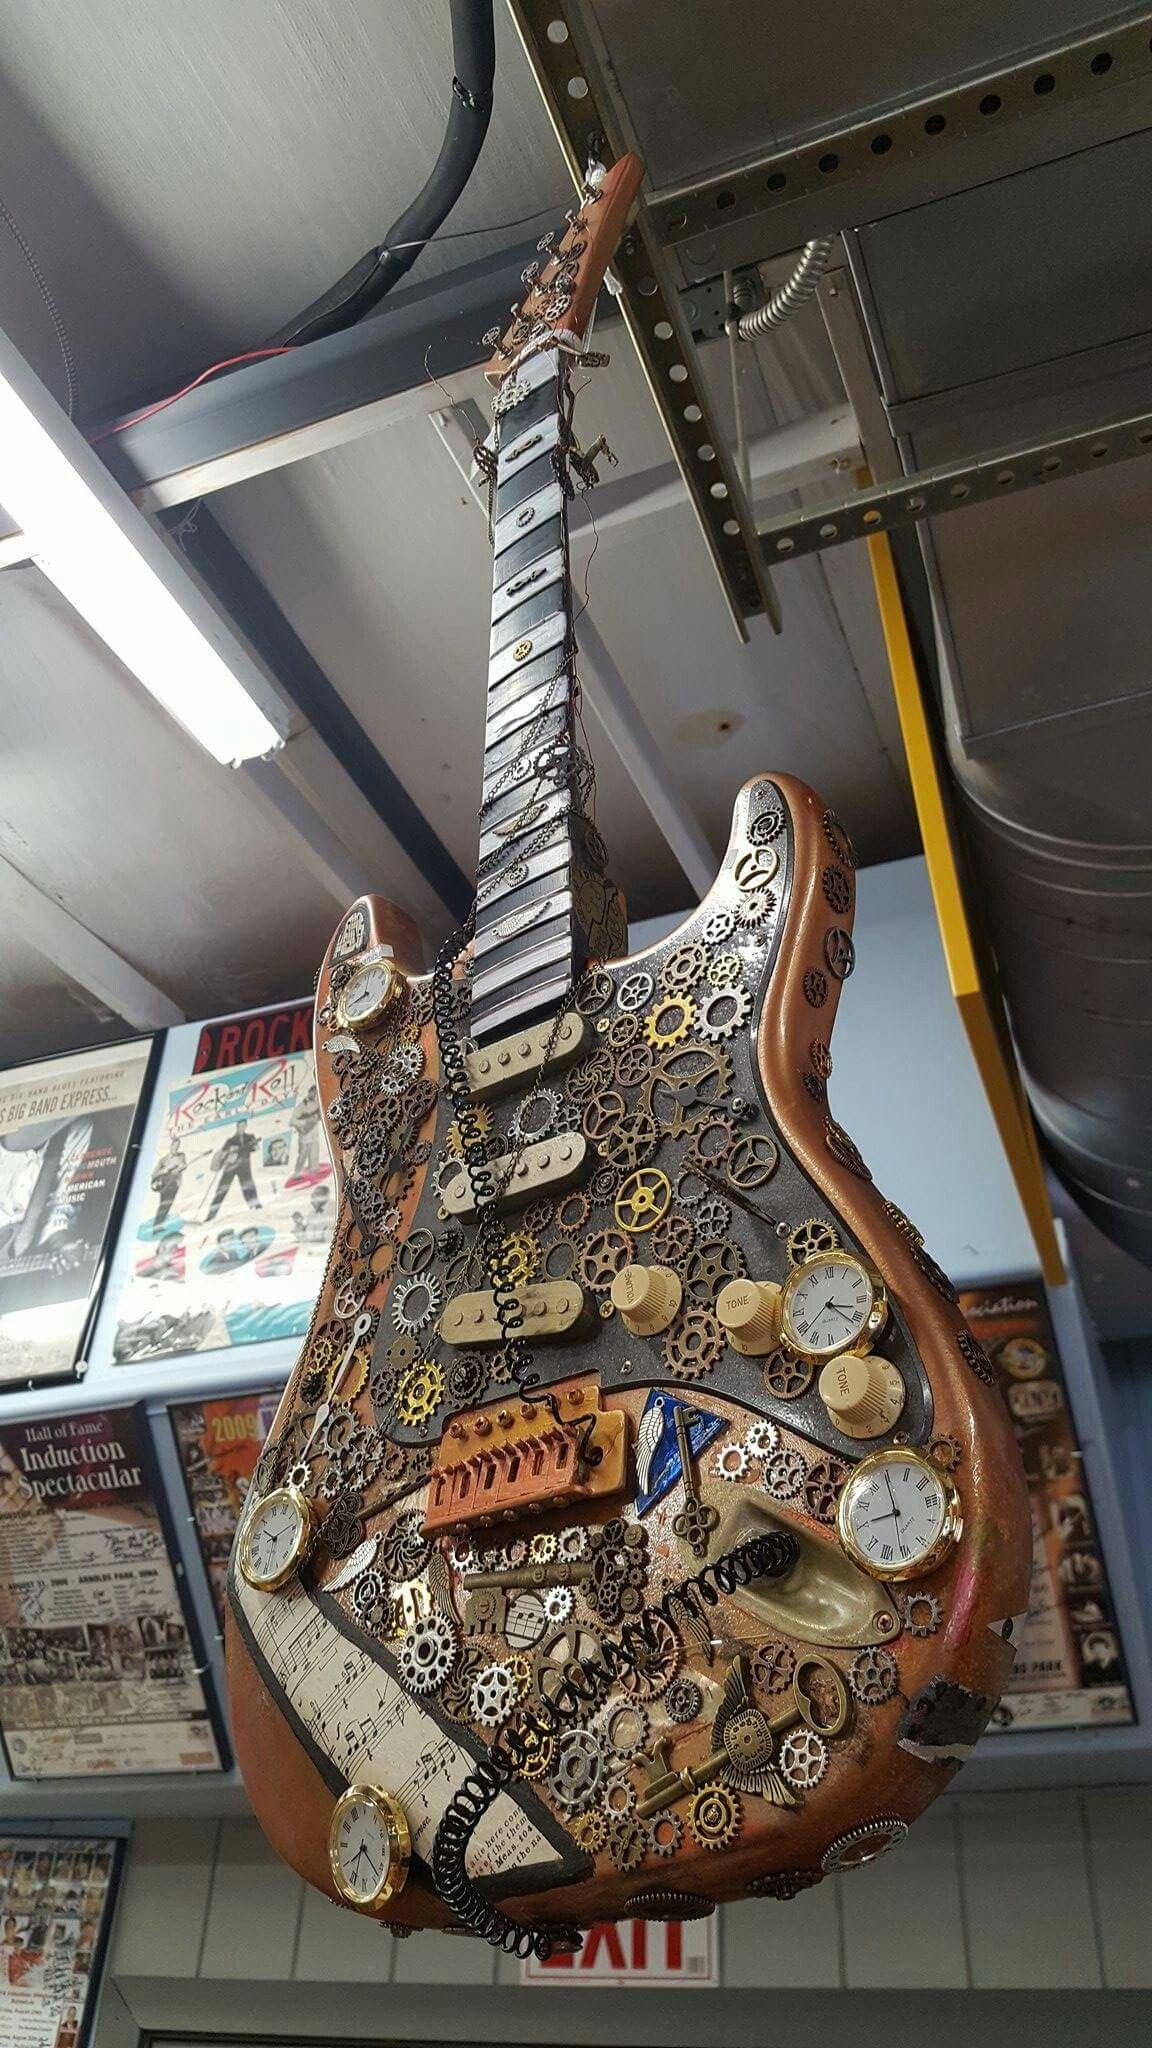 Steampunk Guitar I saw at Lake Okoboji, practically made for you, Harm!